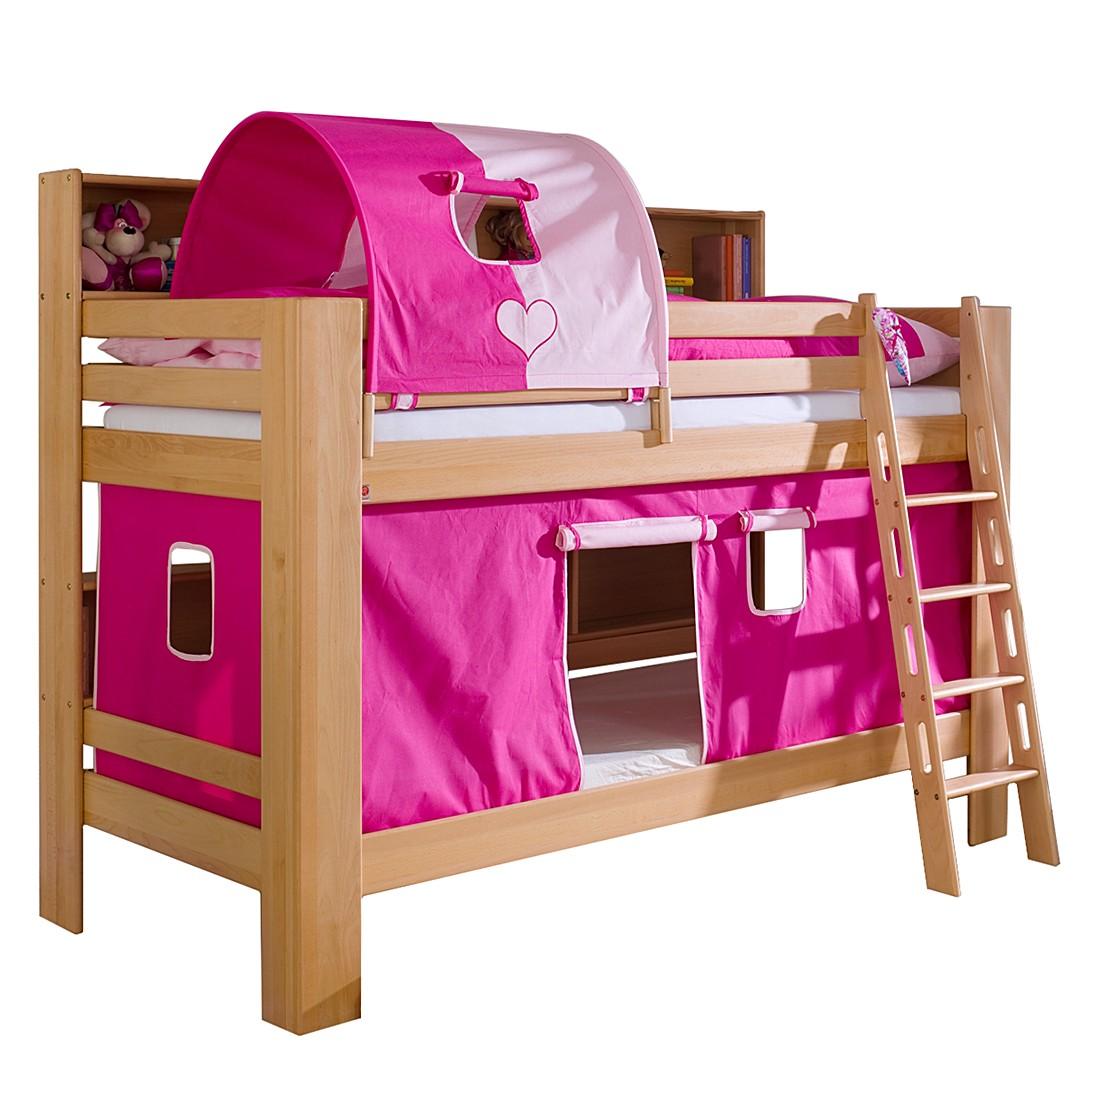 Etagenbett Jan - Buche massiv - Textilset Pink, Relita